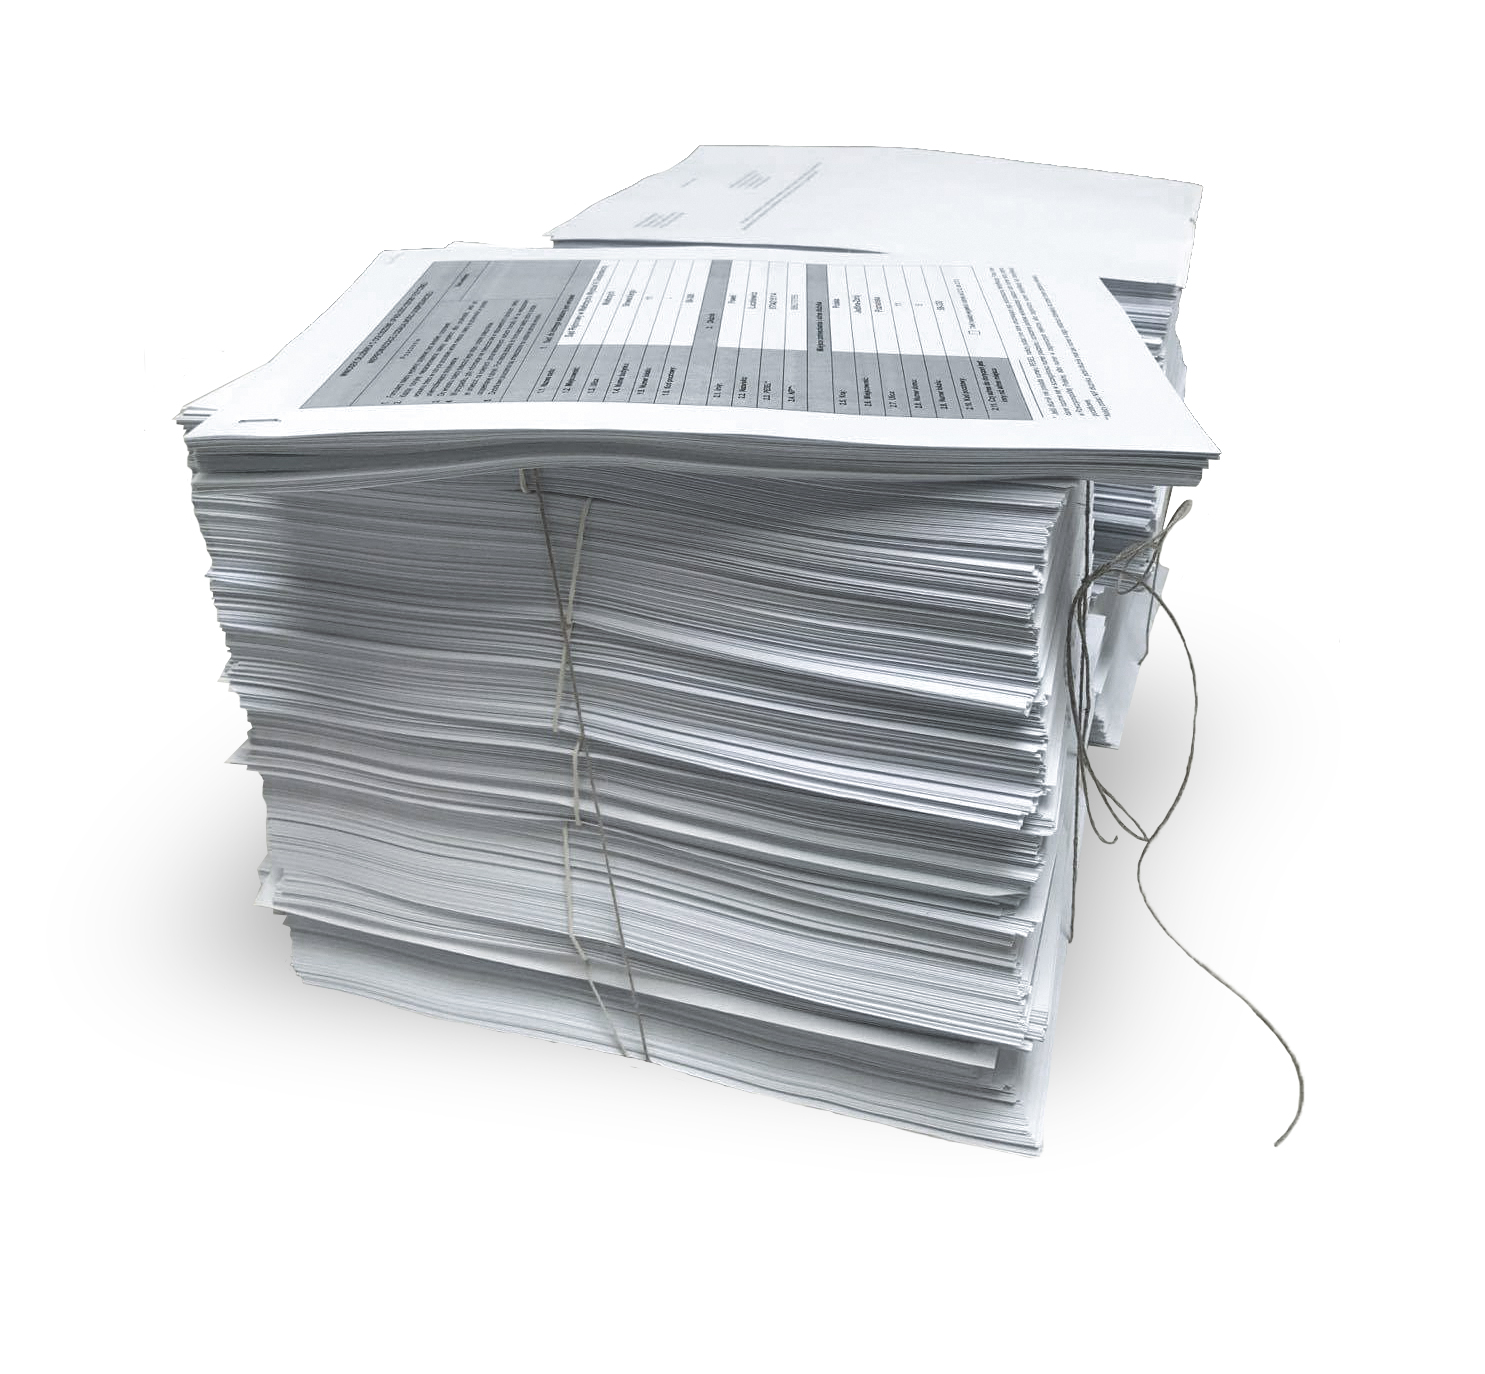 https://serwer1604278.home.pl/konsument.eurekarestrukturyzacje.pl/wp-content/uploads/2020/10/dokumenty-www-kopia.jpg